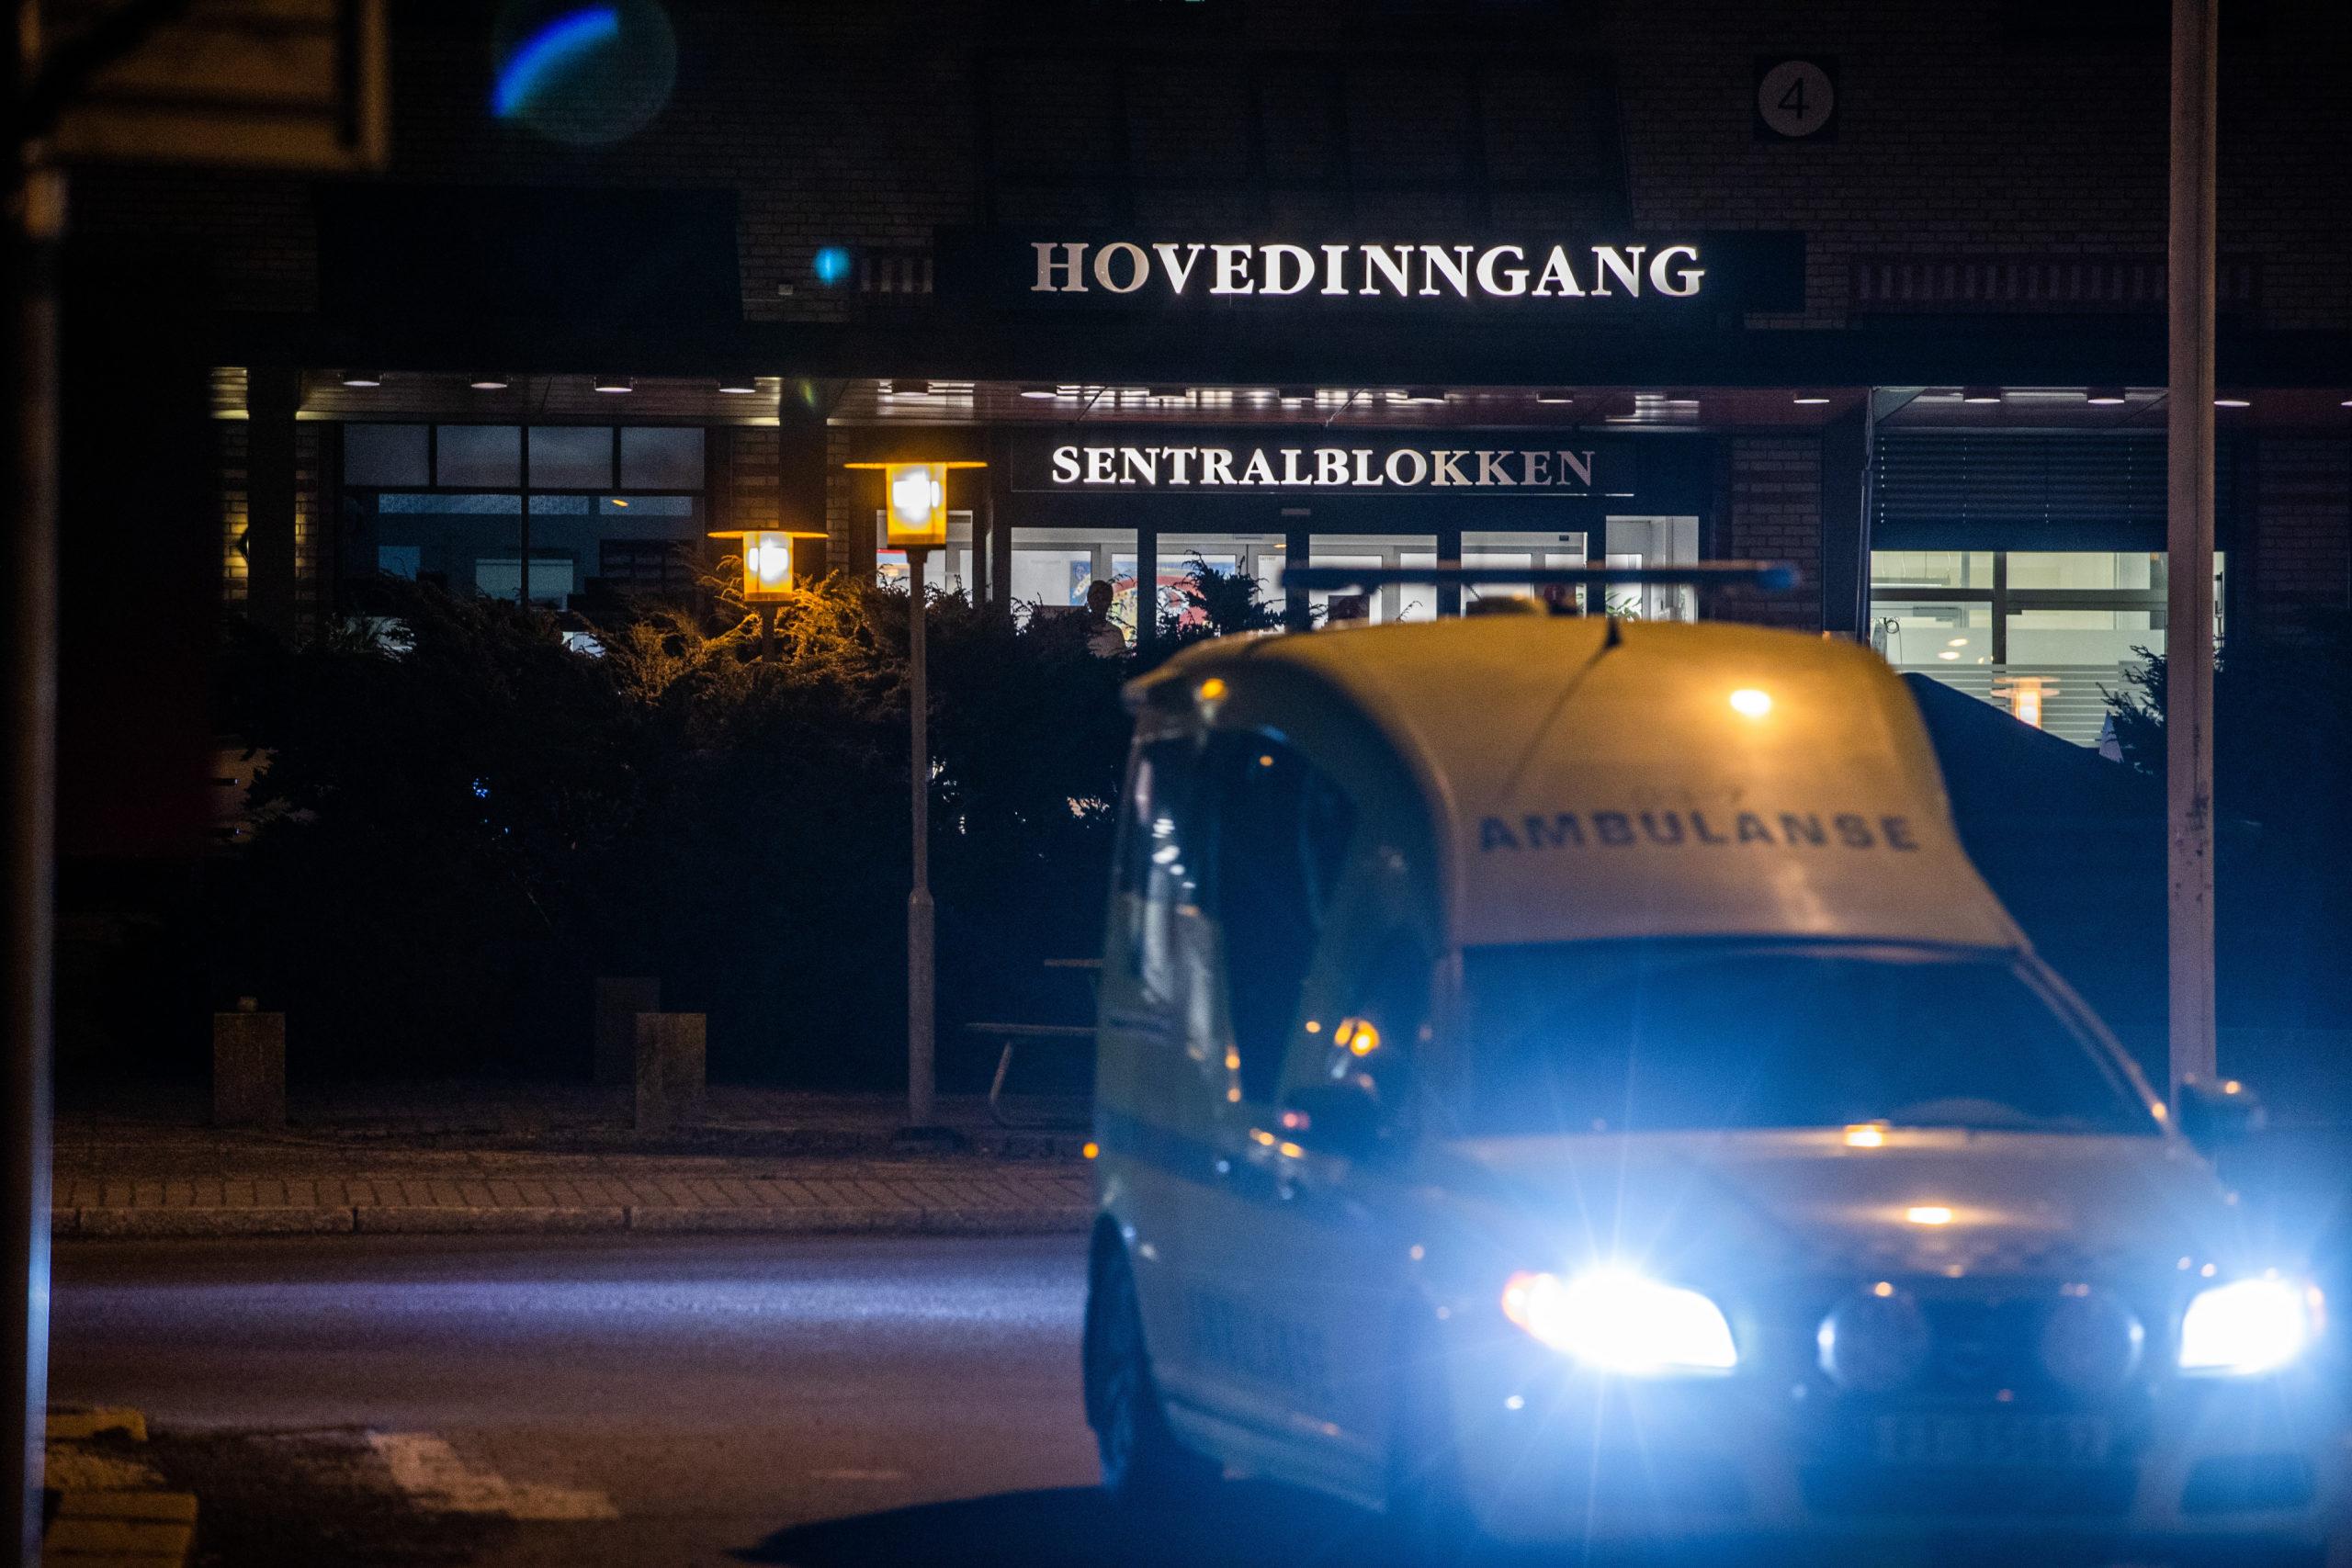 Foto: Frode Hansen / VG